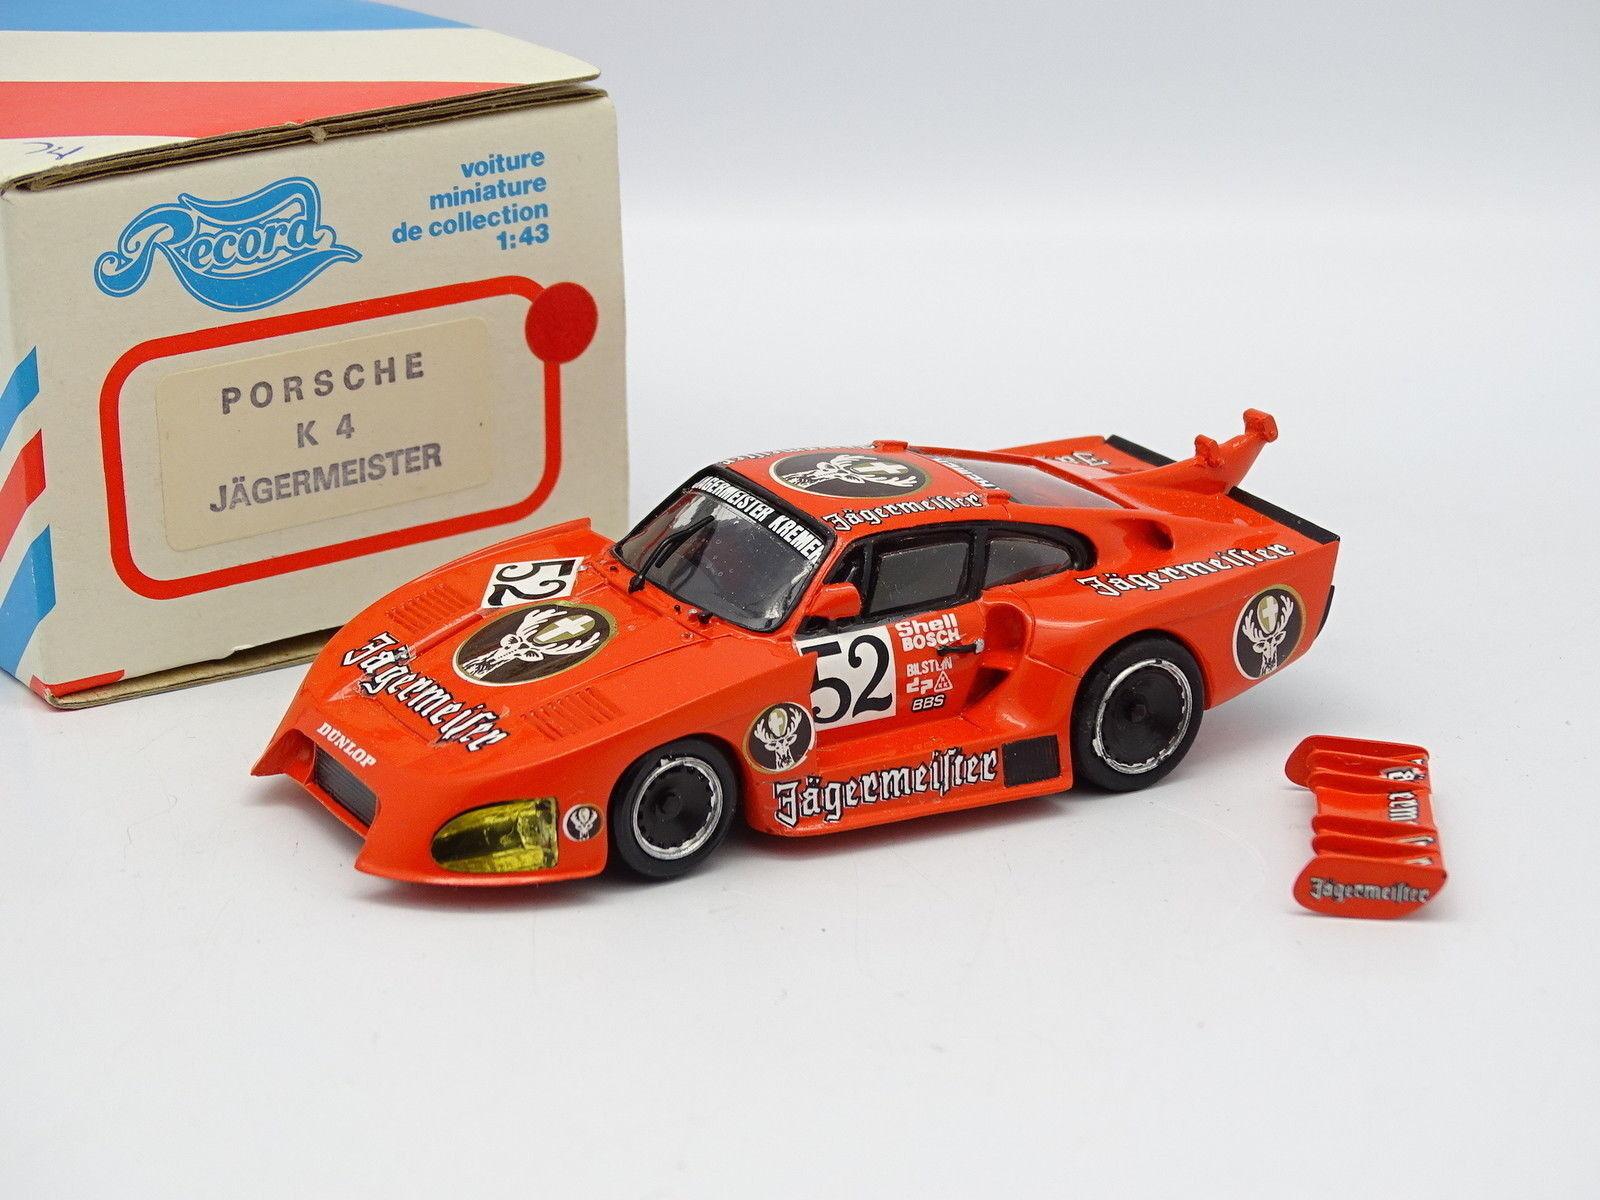 muy popular Record Kit Montado Resina 1 43 - - - Porsche 935 K4 Jagermeister  precios mas baratos